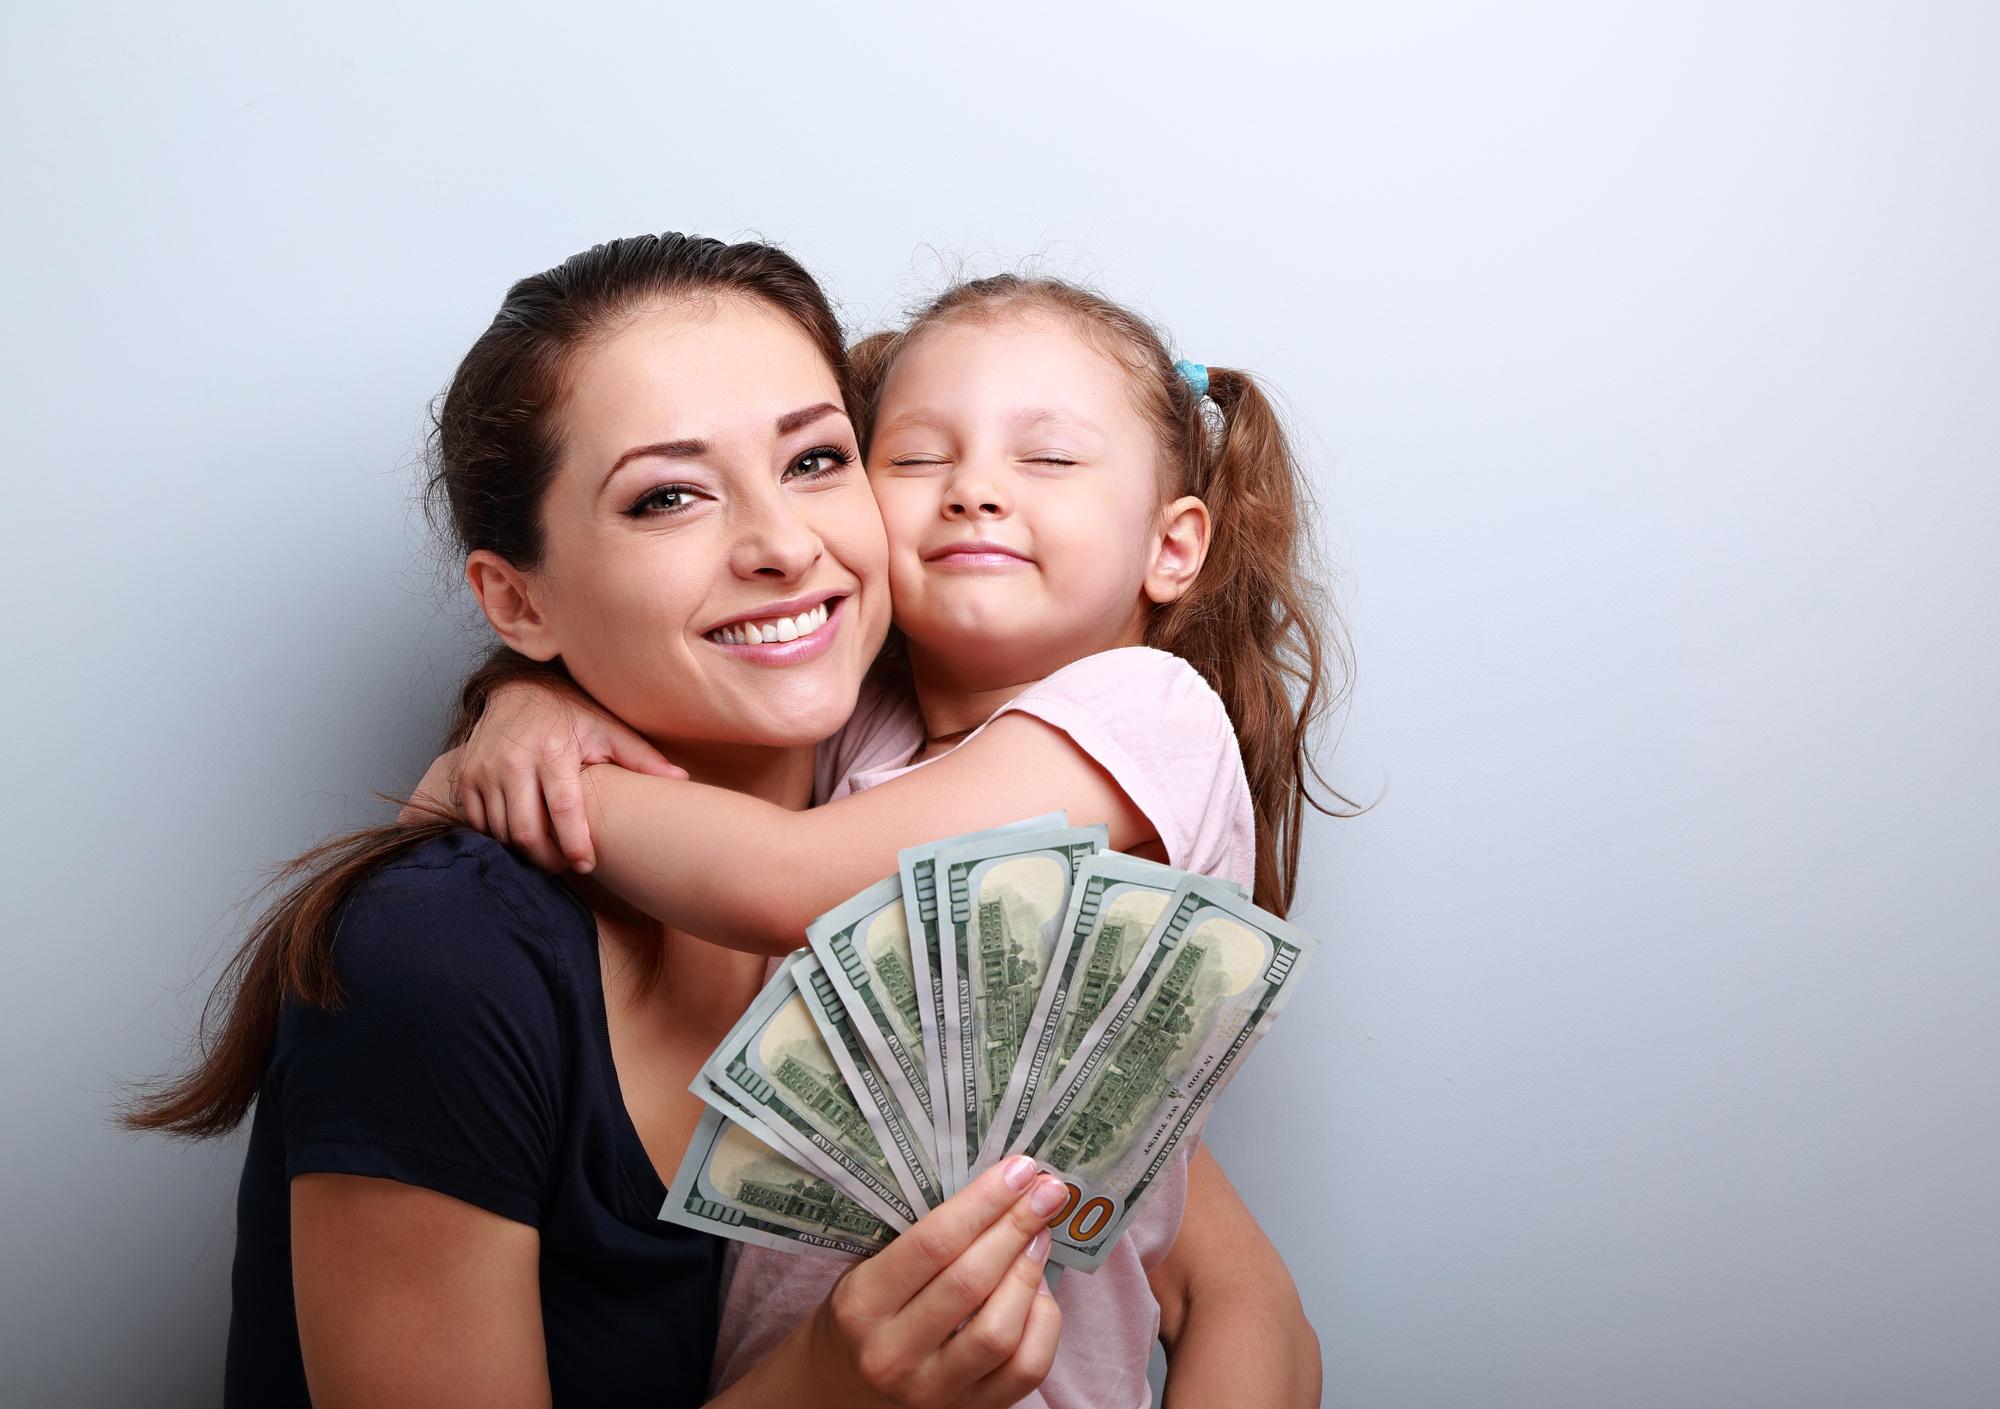 Woman getting a quick cash loan